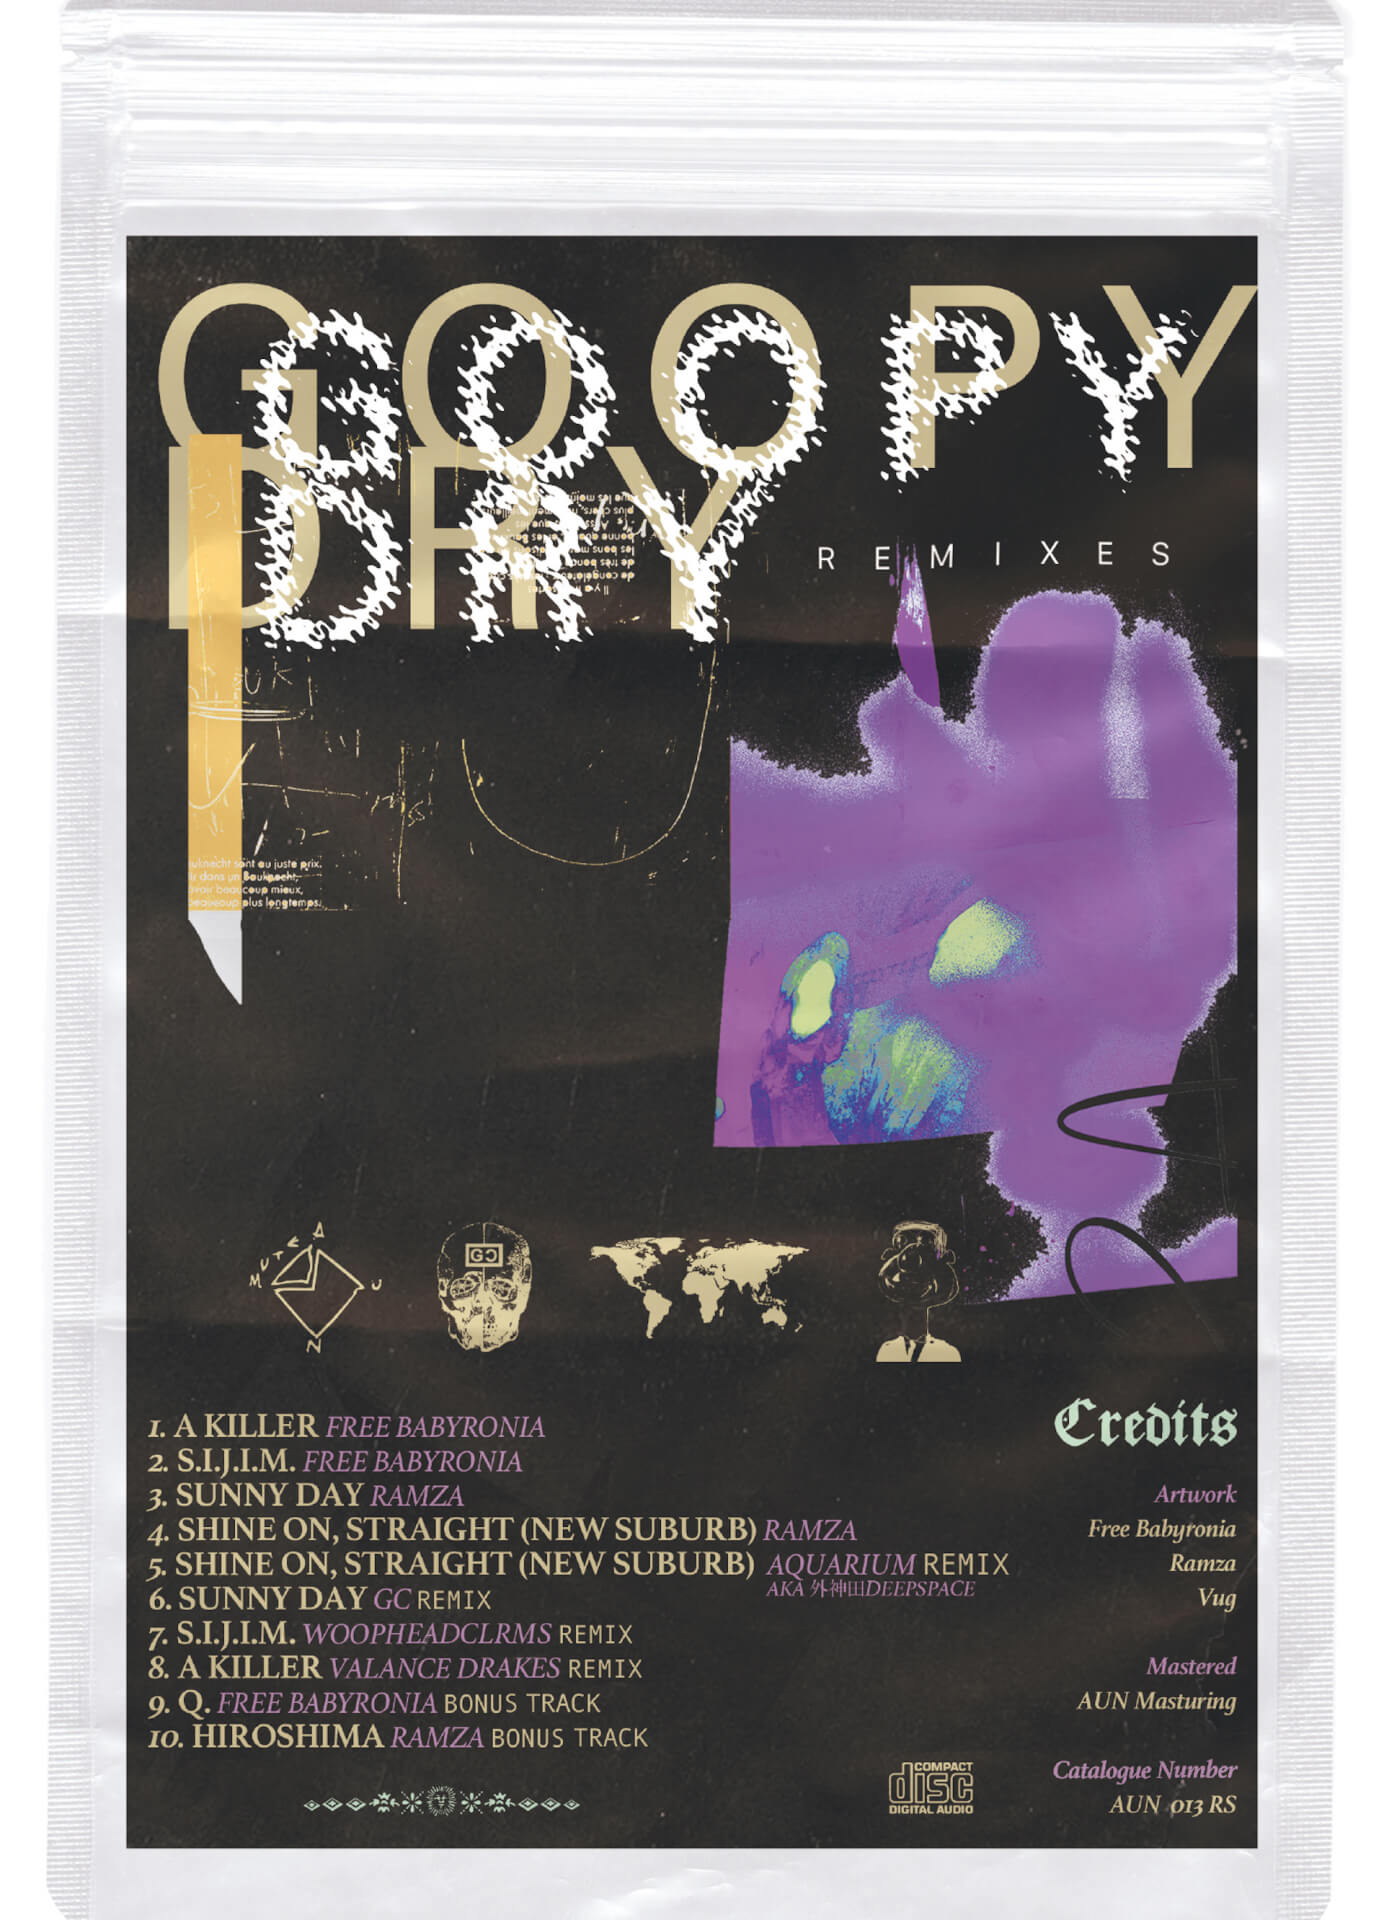 Free Babyronia&RamzaによるEP『GOOPY DRY』のリミックス盤が発売決定!未発表曲も収録 music210126_freebabyronia_ramza_1